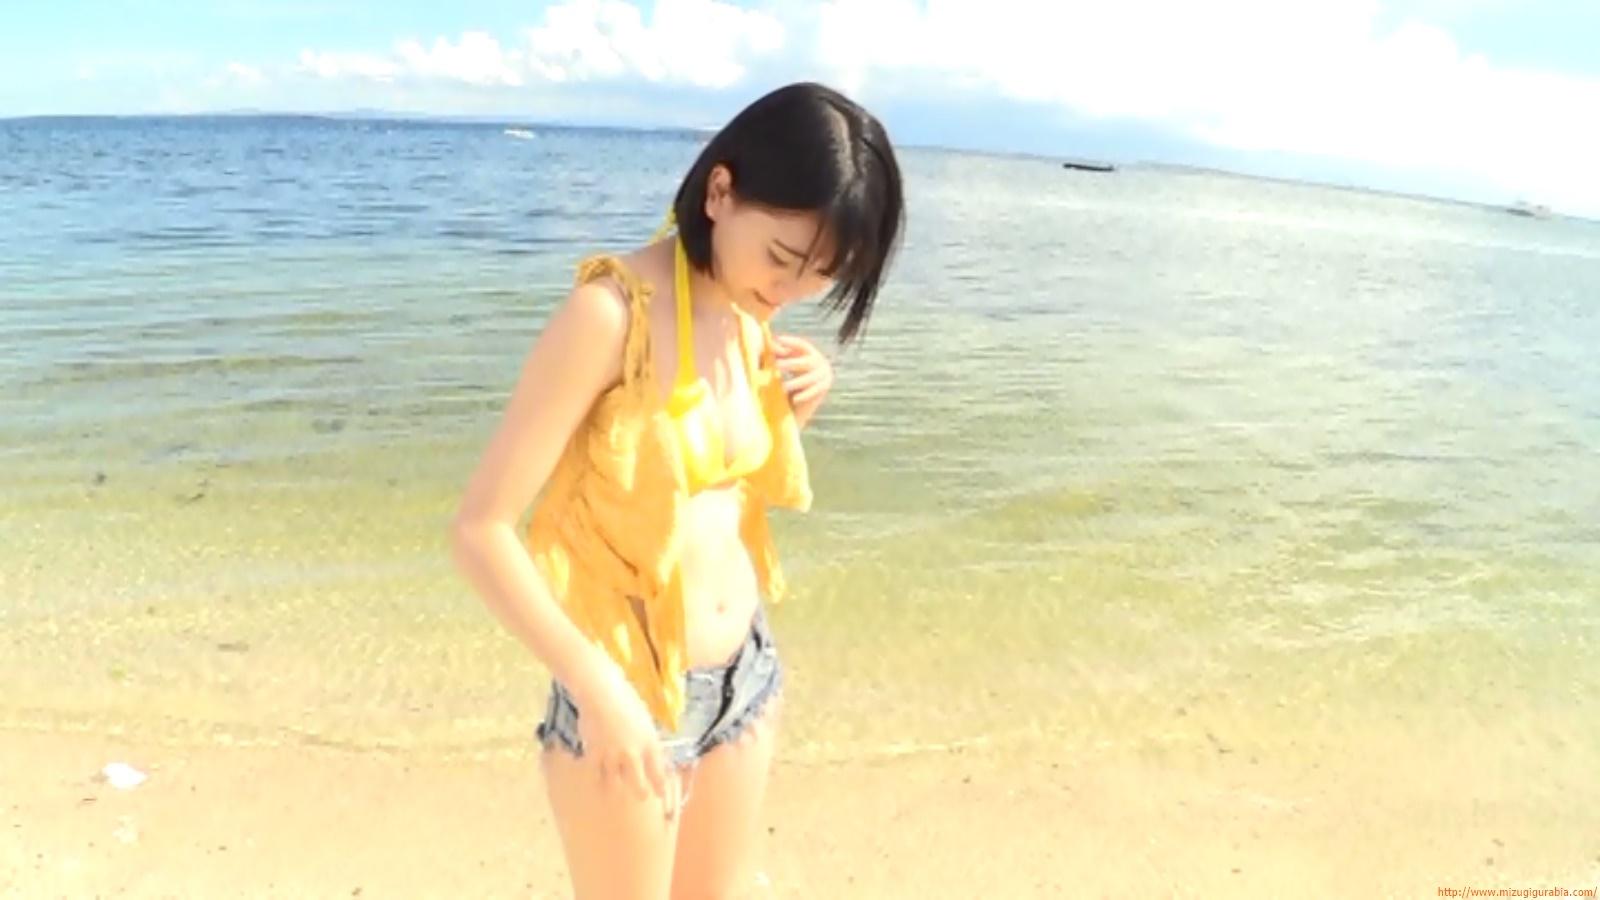 Beach dating112